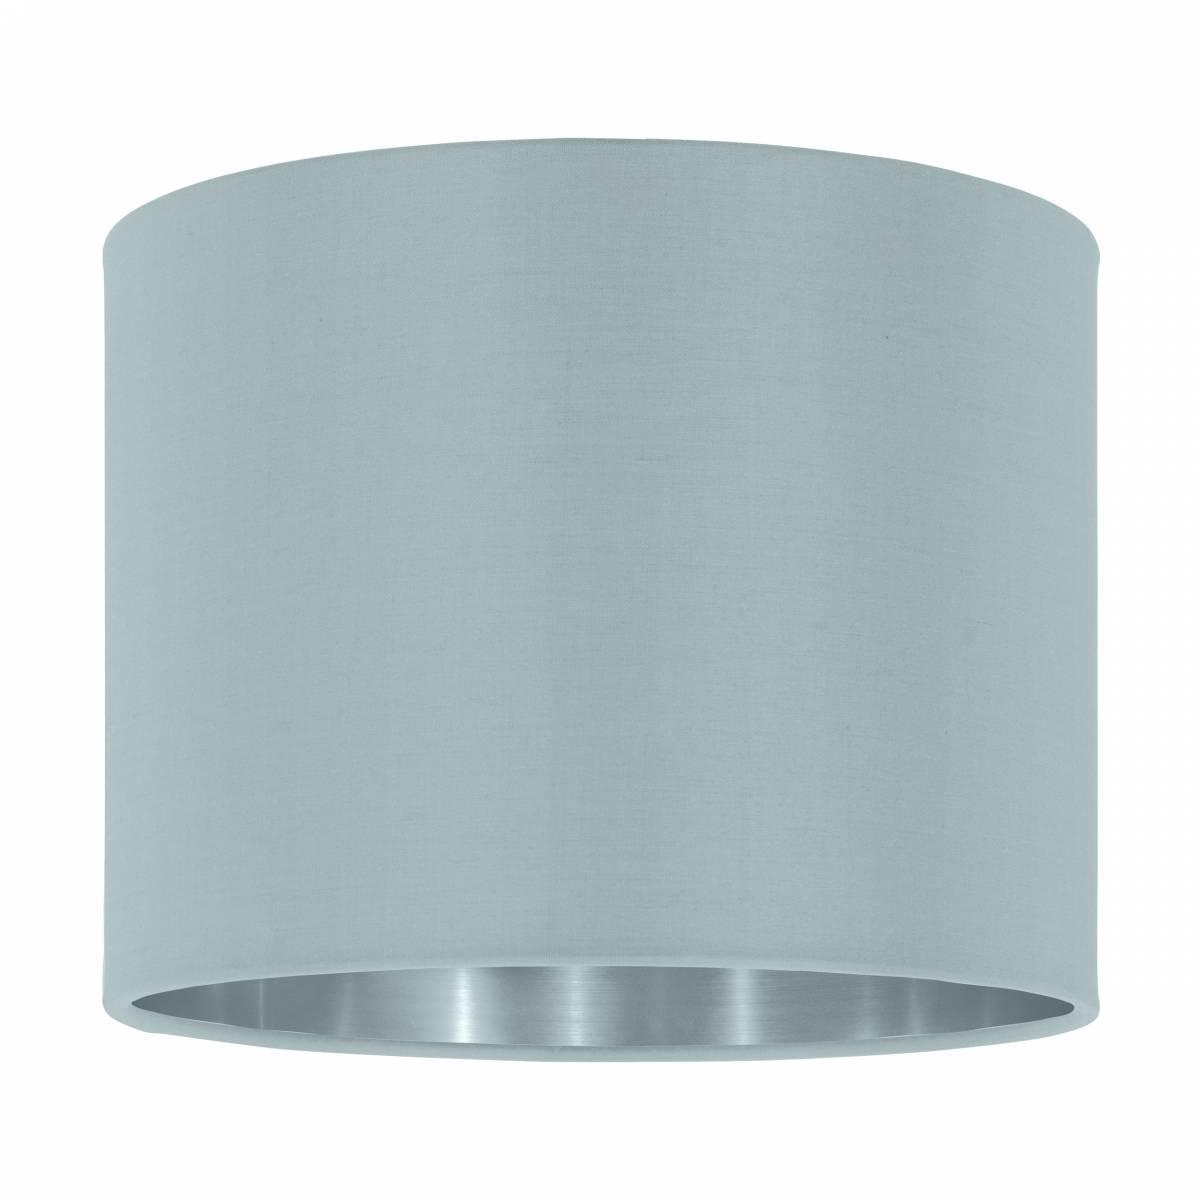 Shade for Pendant luminaire Pasteri Pro/Marausa grey/silver